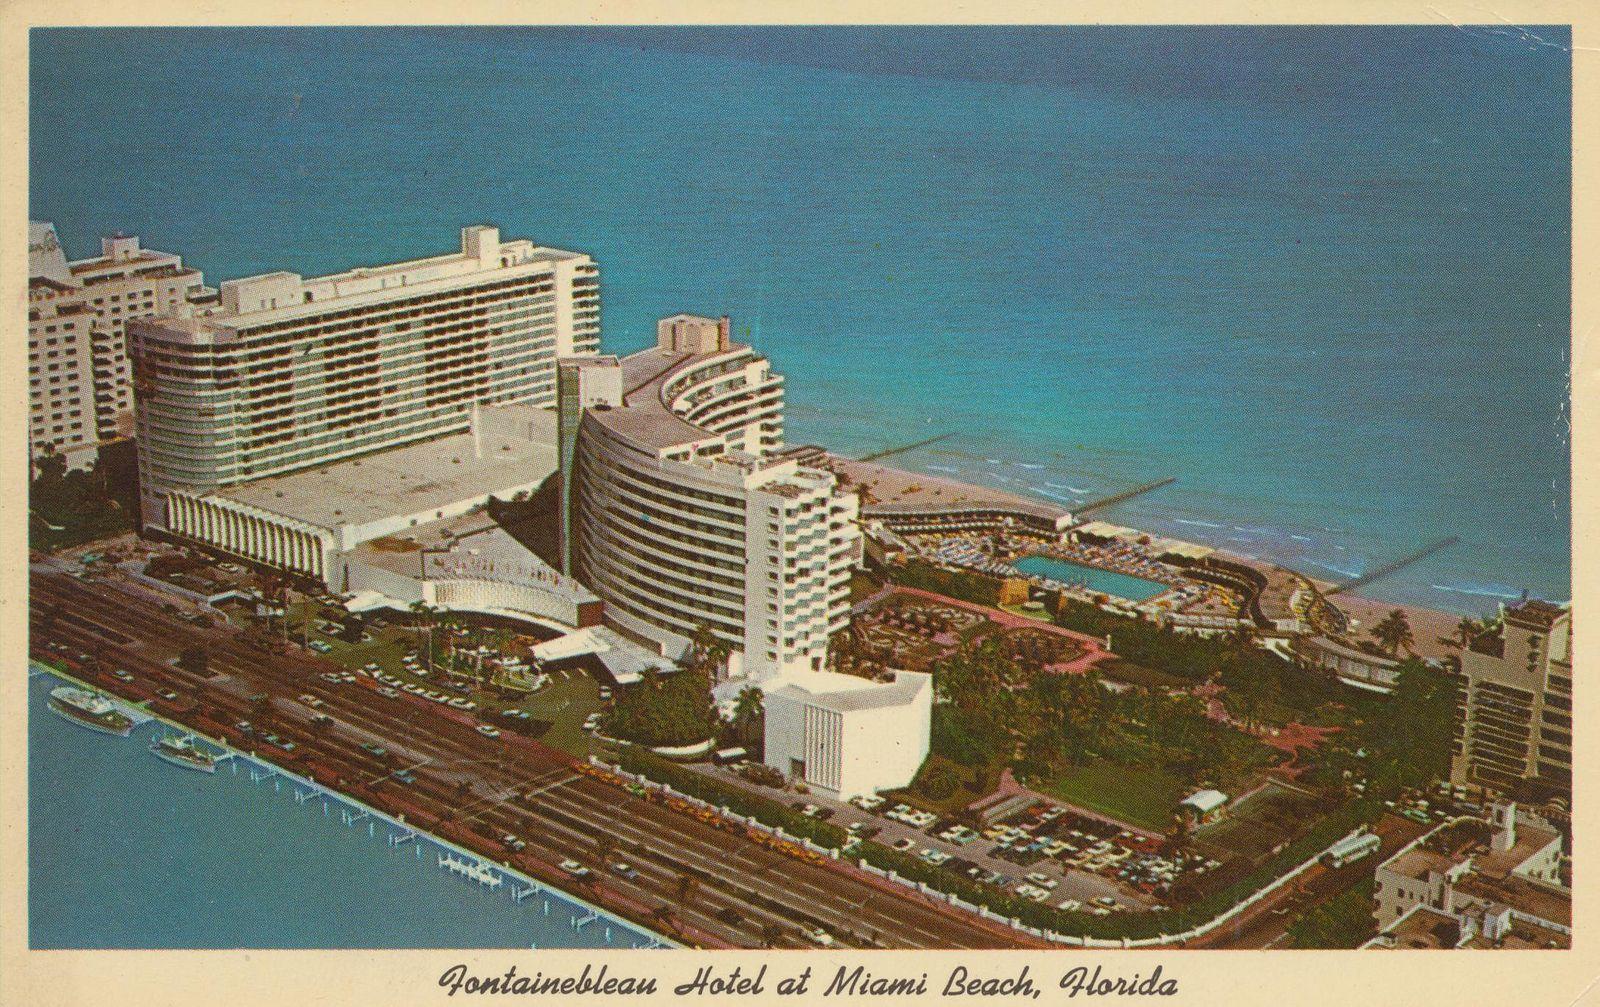 fontainebleau hotel - miami beach, florida | miami beach